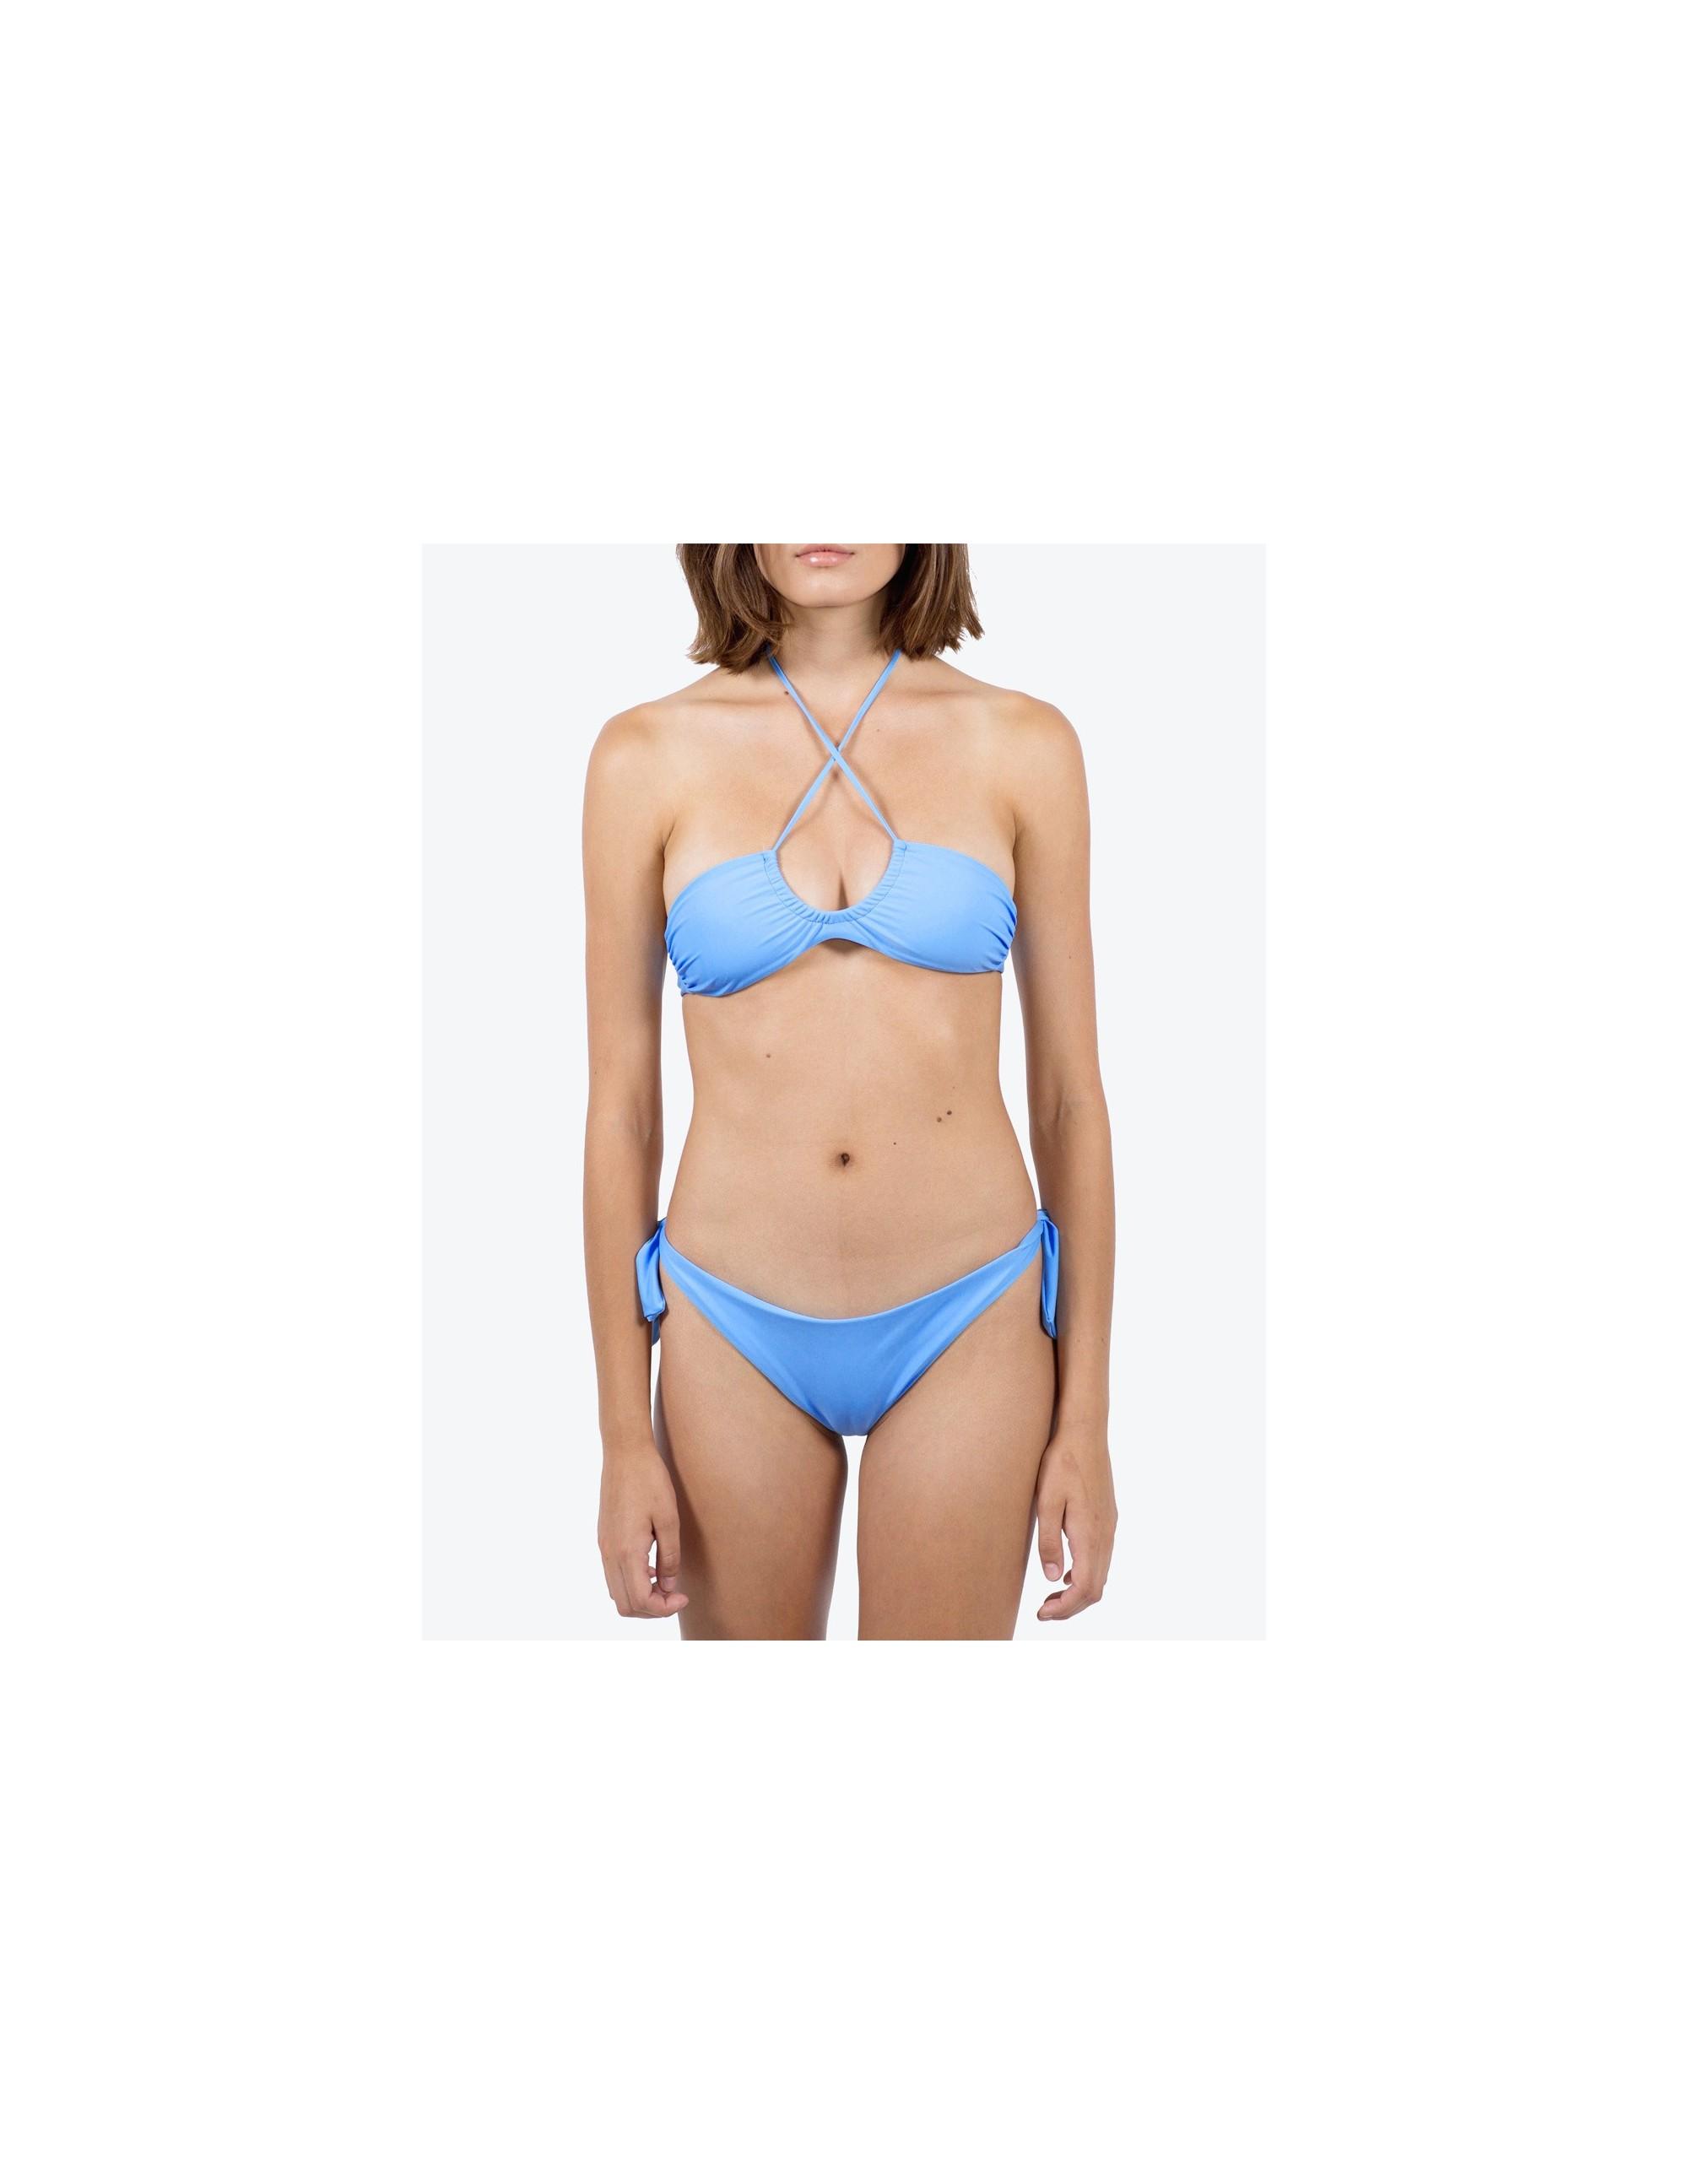 CONTA bikini bottom - SKY BLUE